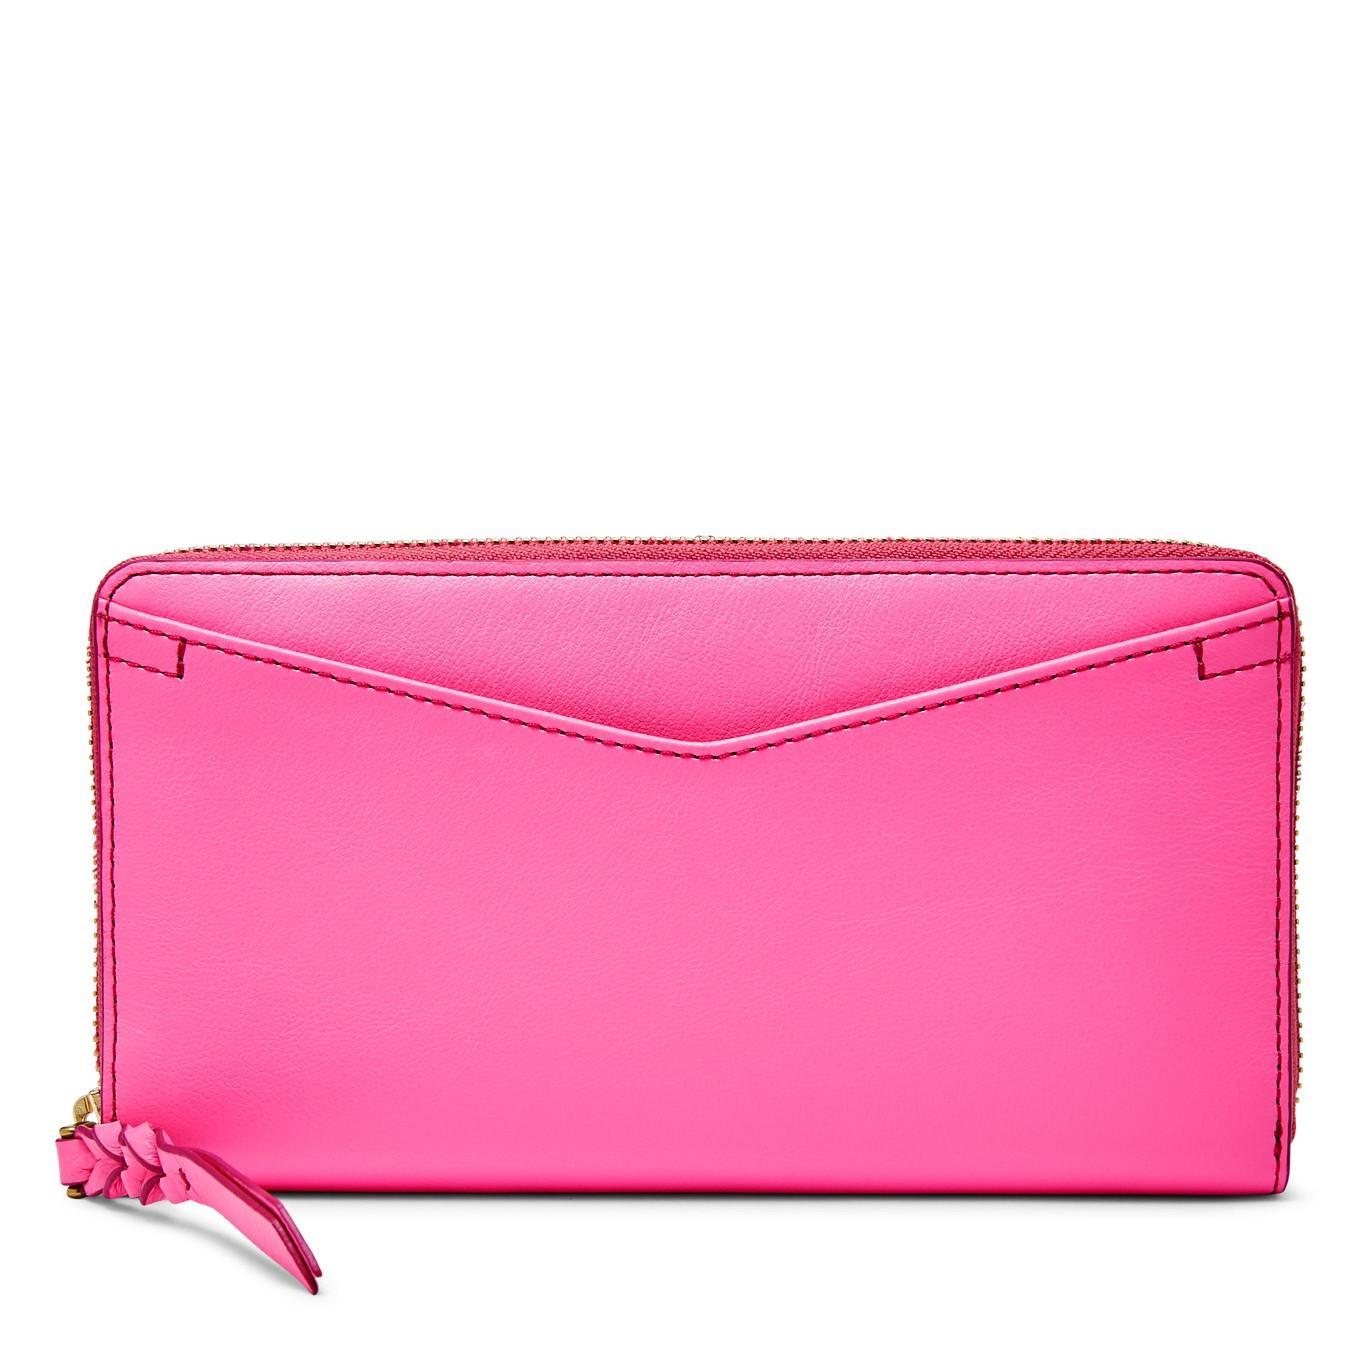 Fossil Caroline RFID Zip Wallet – Neon Pink, SL 7354673